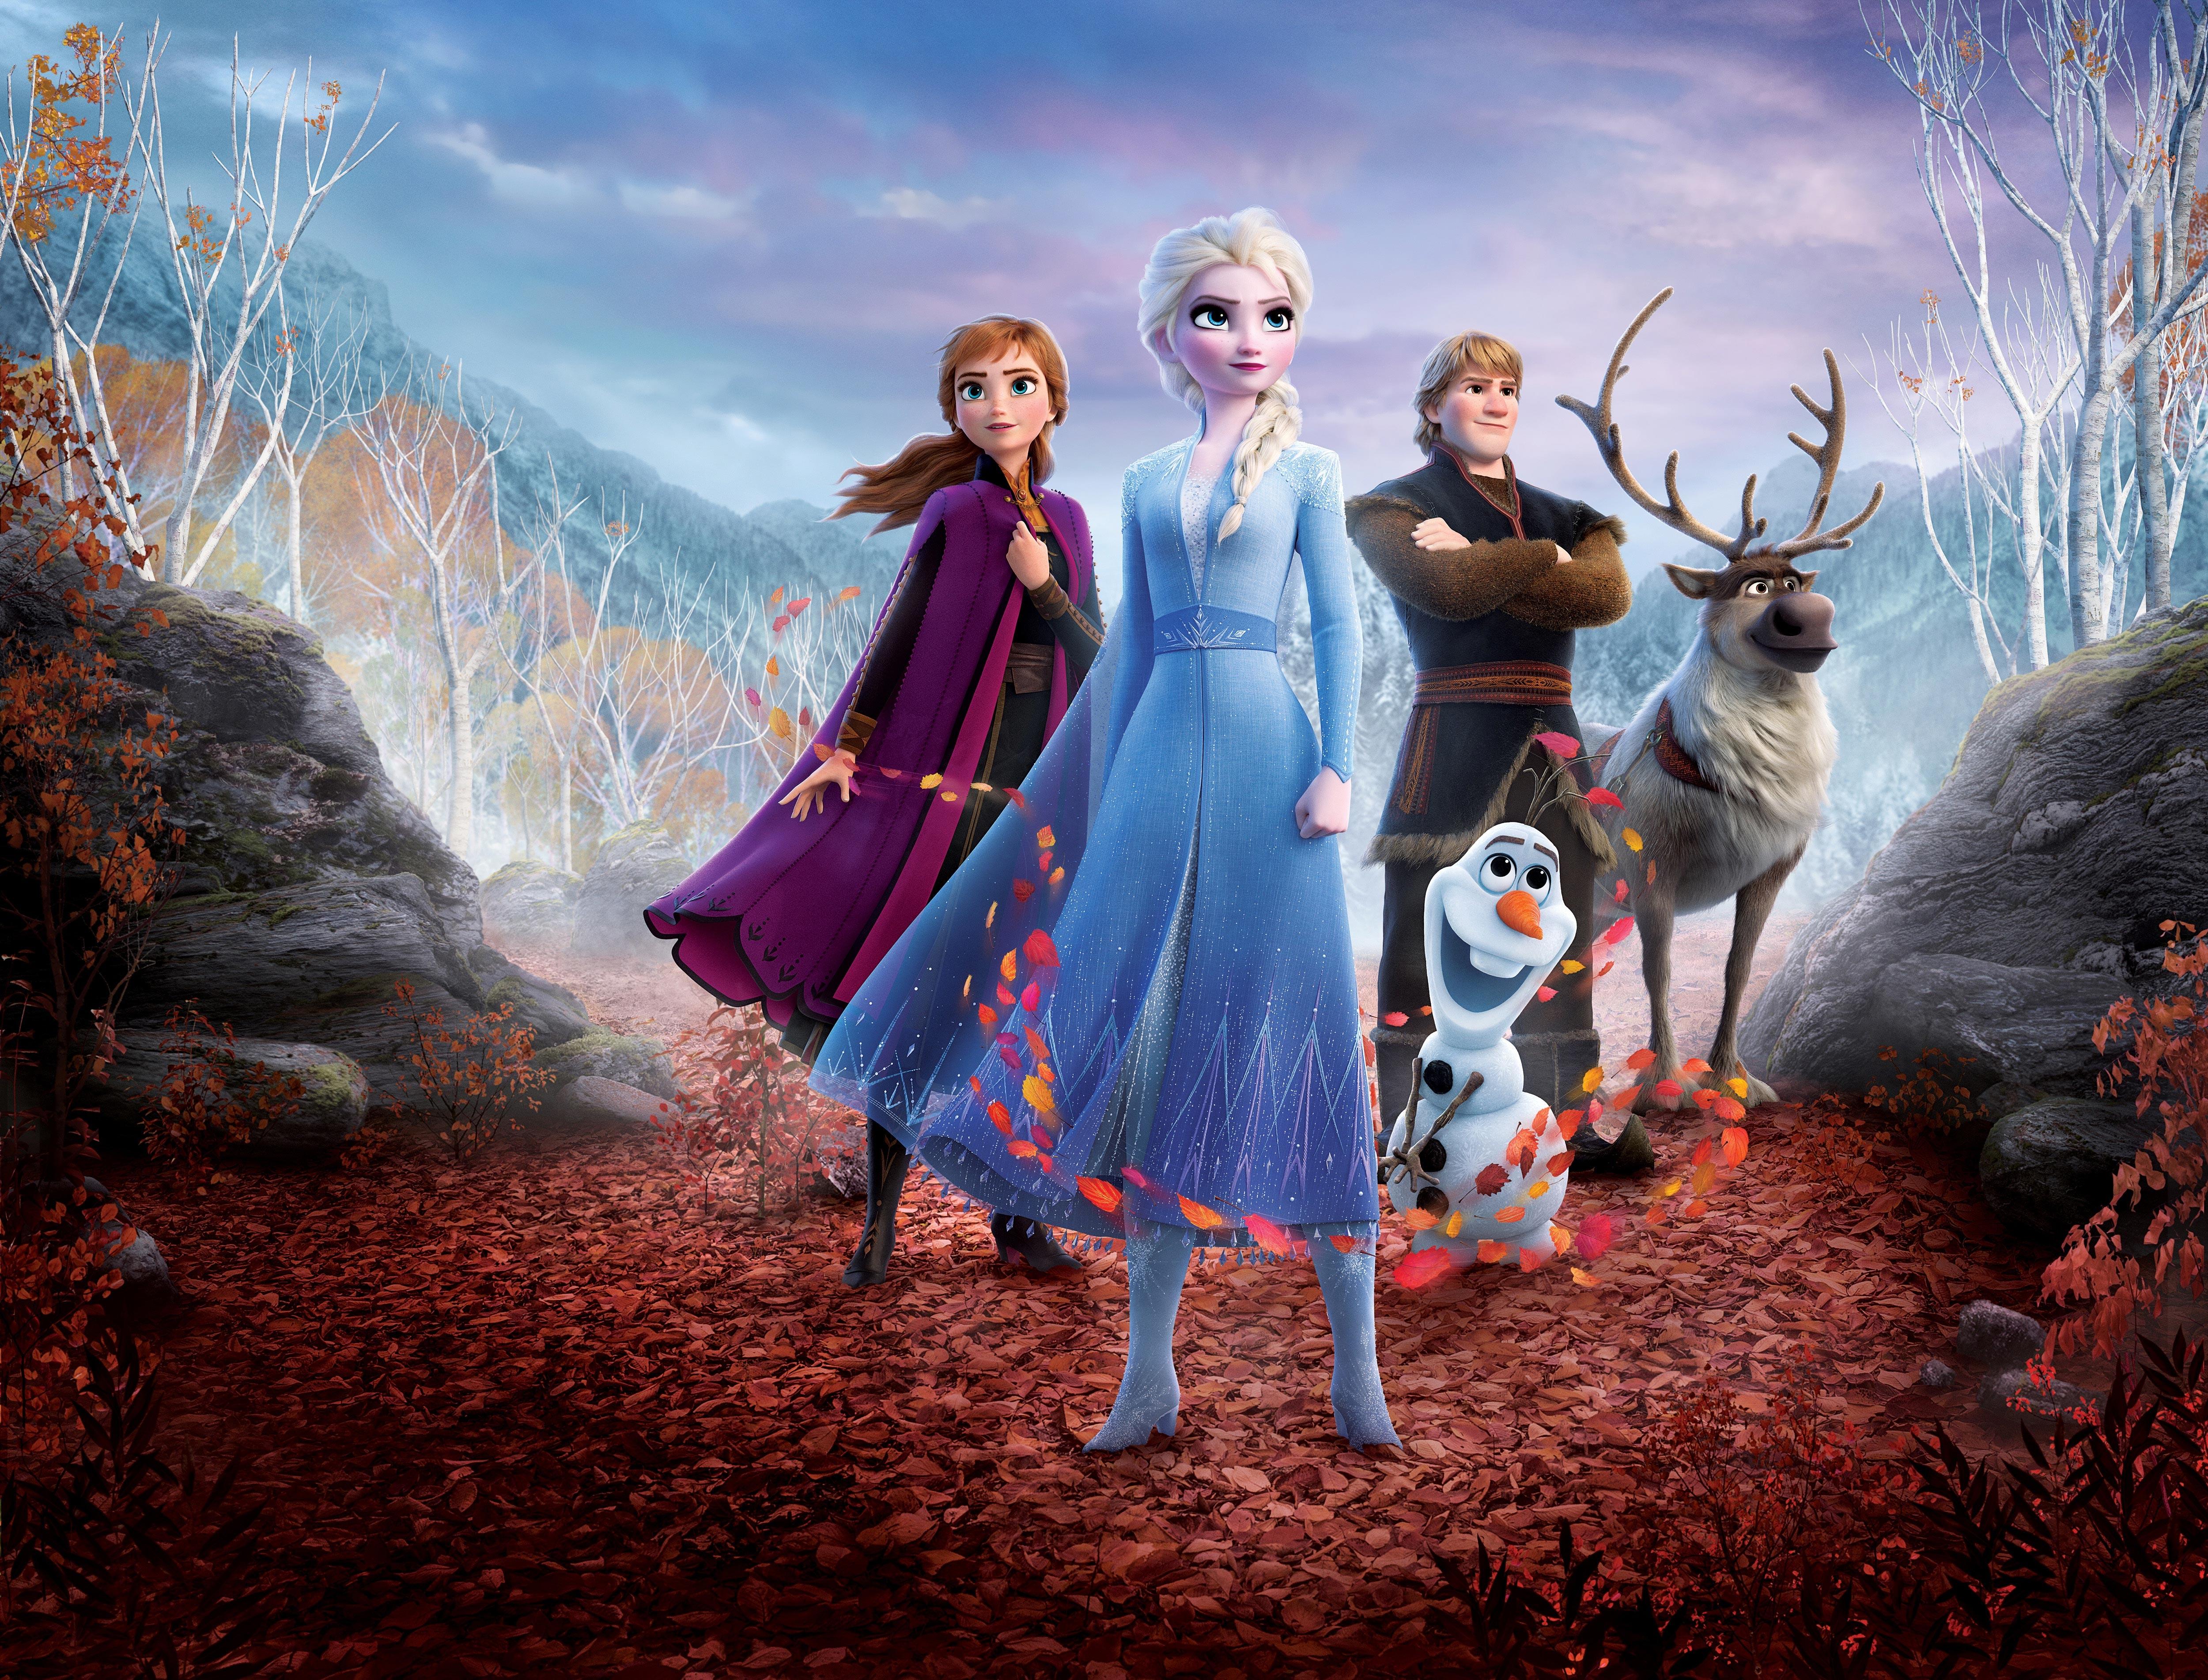 Frozen 2 Wallpaper, HD Movies 4K Wallpapers, Images ...